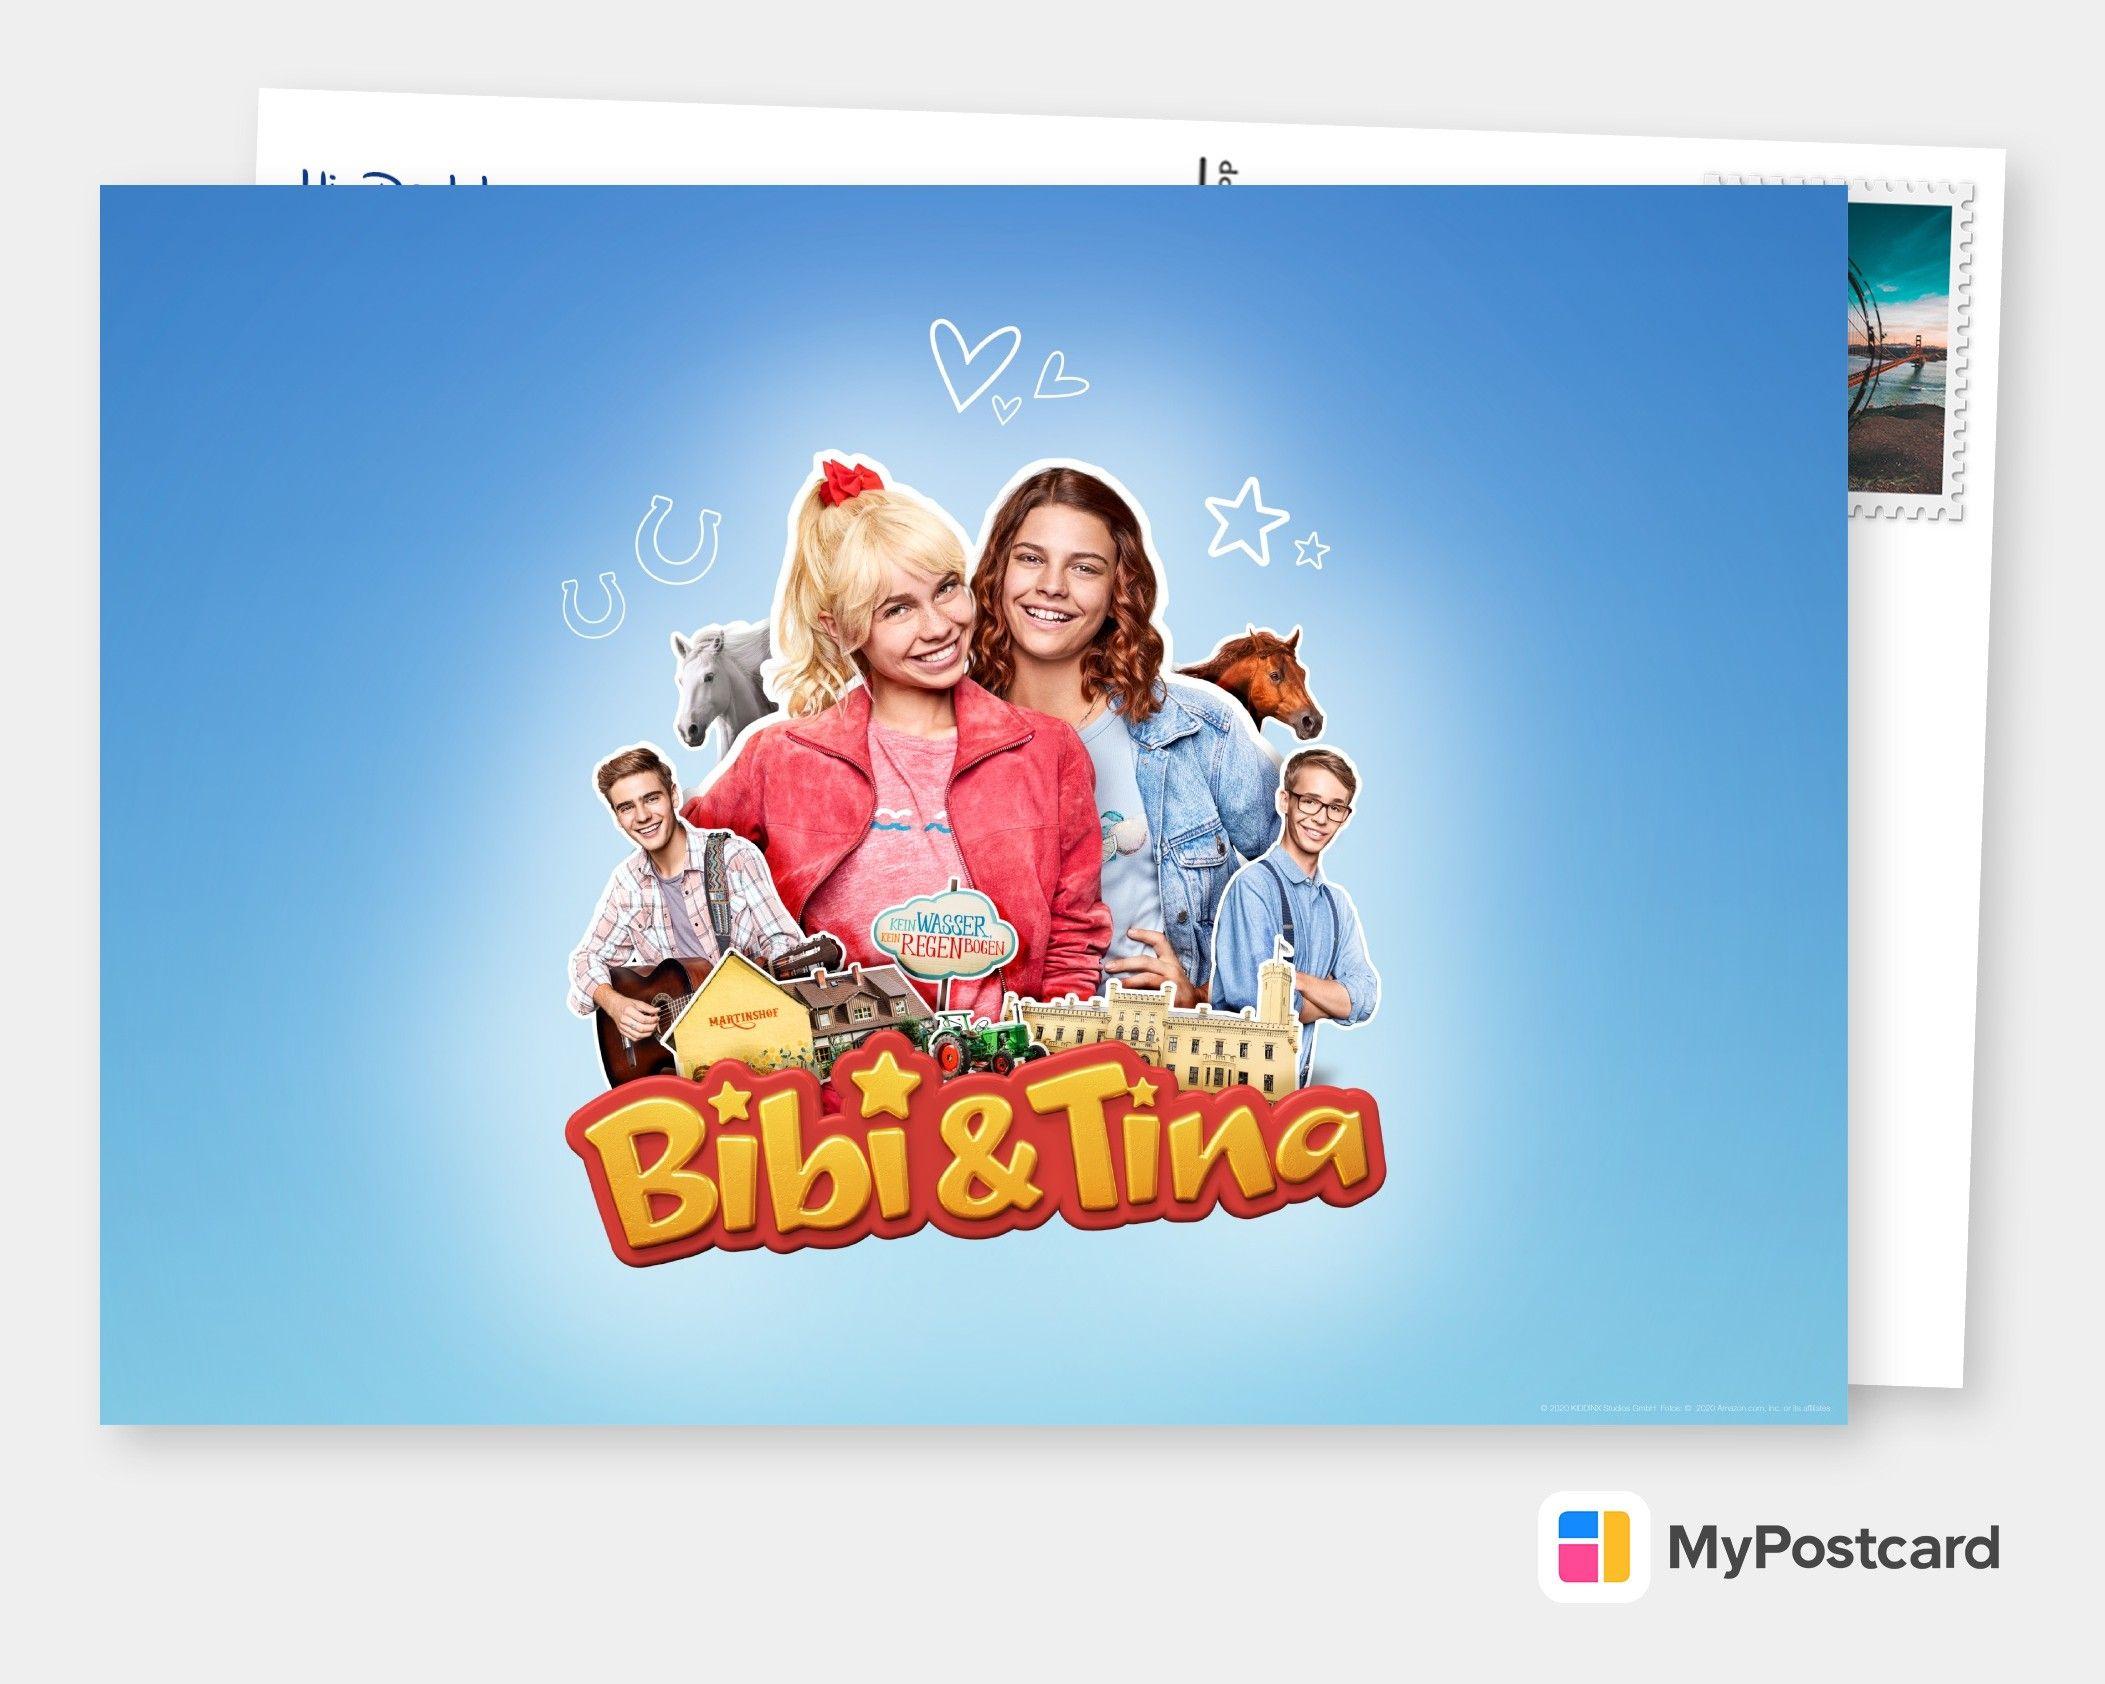 Bibi Tina Jetzt In Serie Film Musik Karten Echte Postkarten Online Versenden Postkarten Karten Postkarten Online